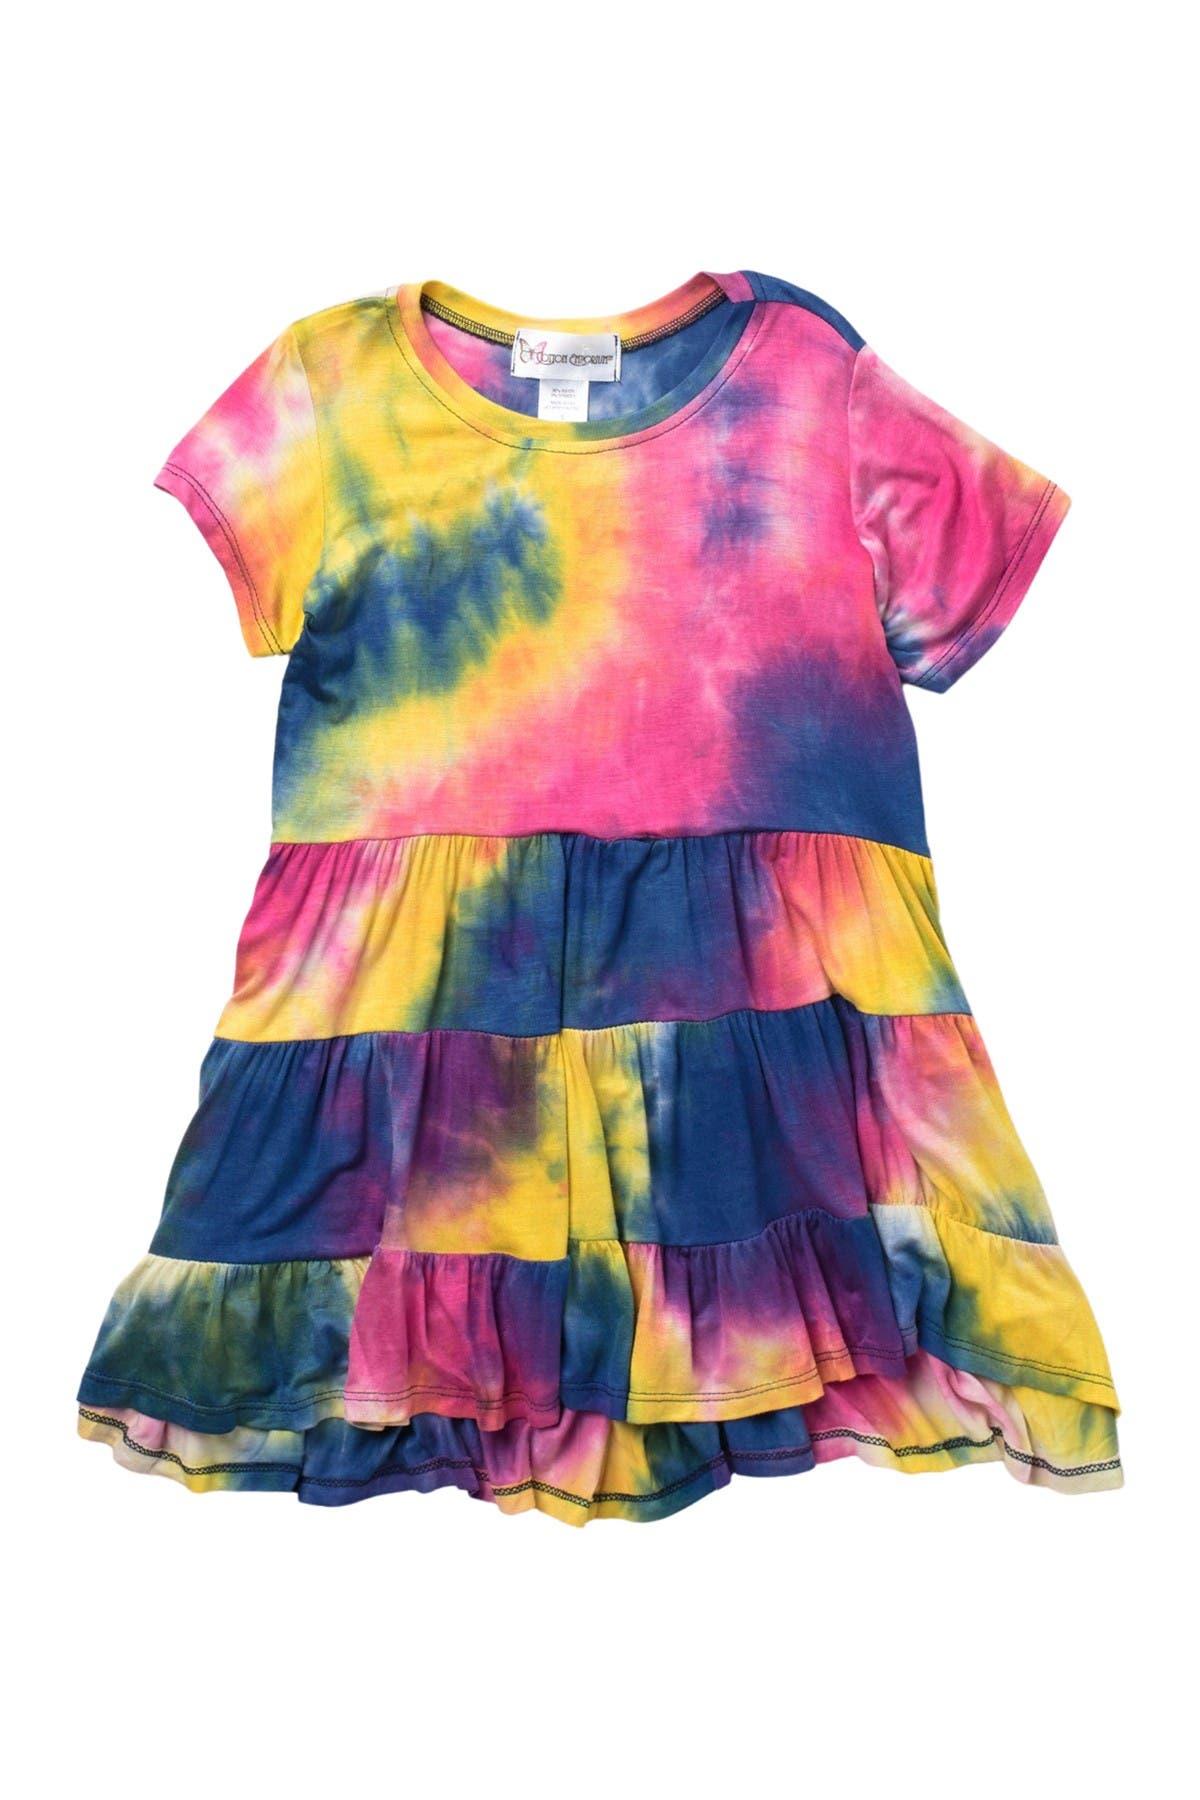 Image of Cotton Emporium Short Sleeve Tiered Jersey Dress